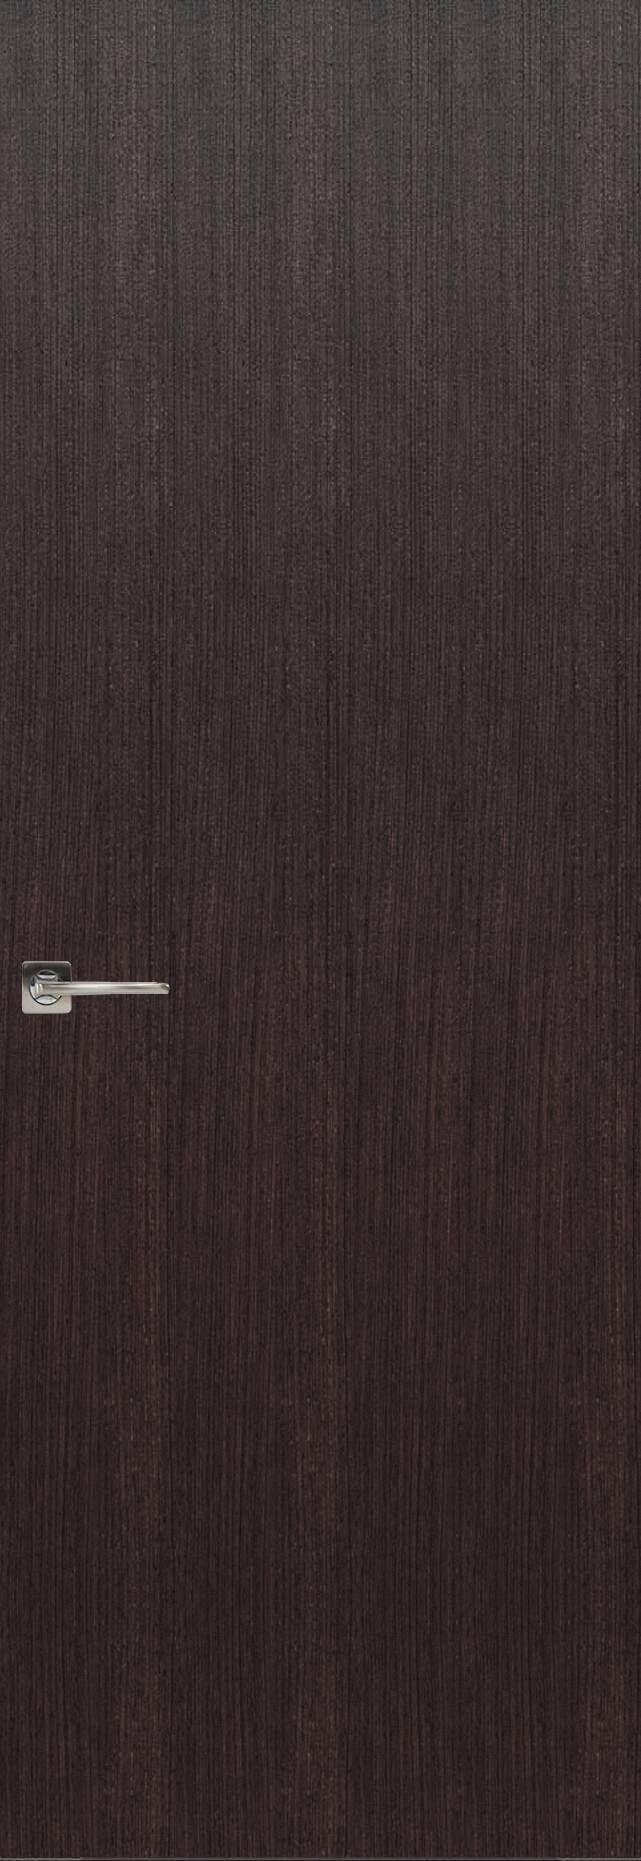 Tivoli А-1 Невидимка цвет - Венге Шоколад Без стекла (ДГ)